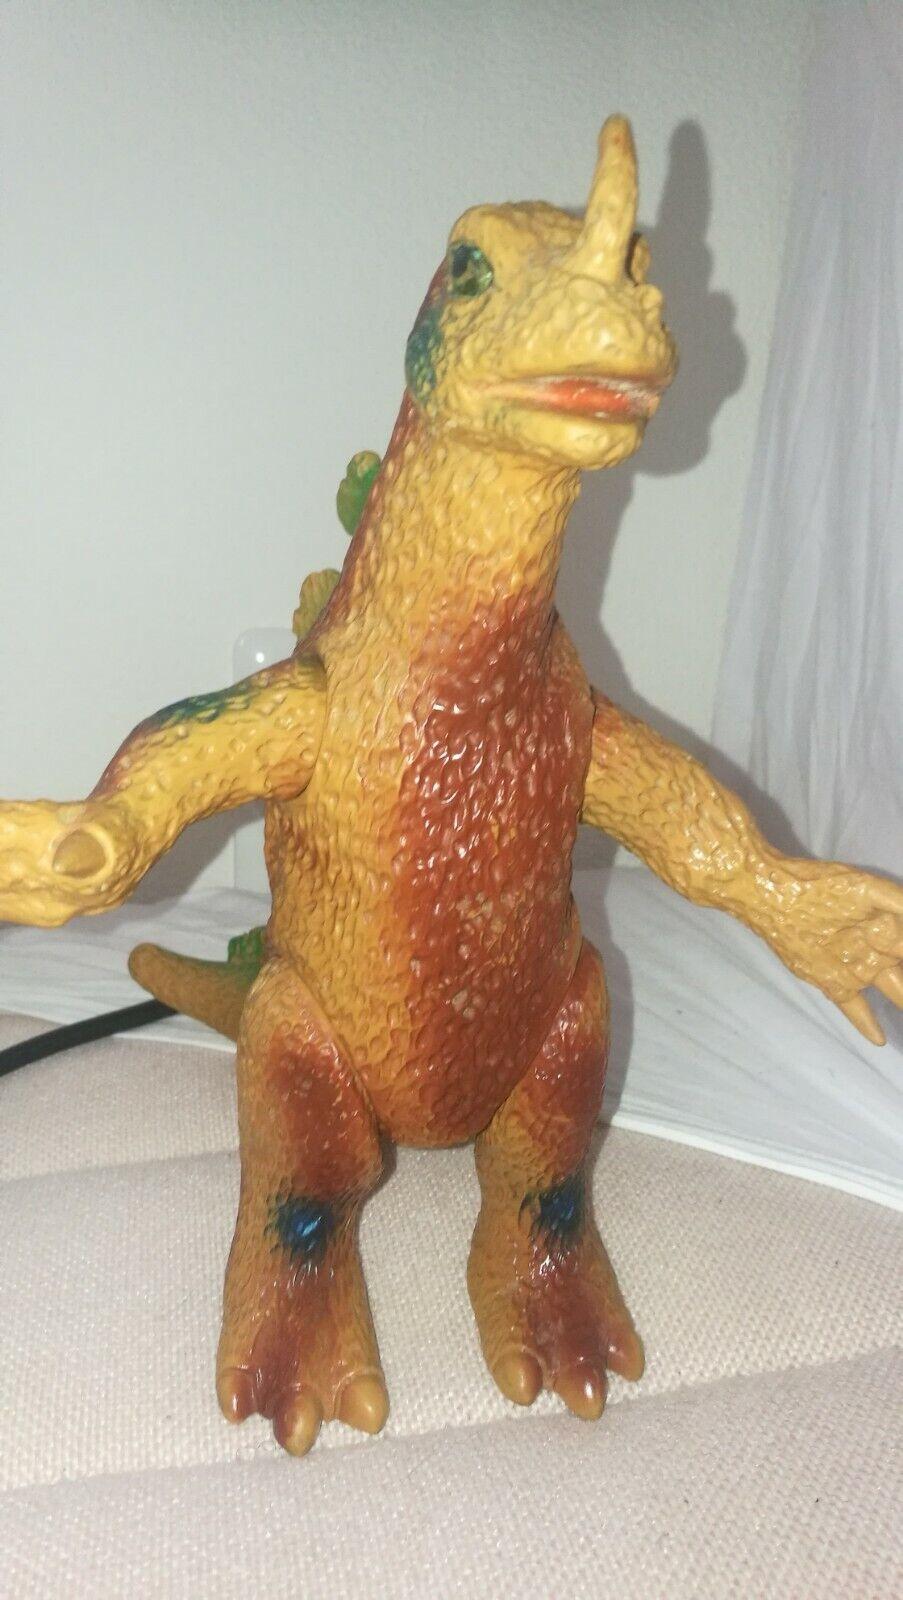 Marusan King Godzilla 1970 Japan Sofubi Soft Vinyl Vintage Old Toy Kaiju Figure